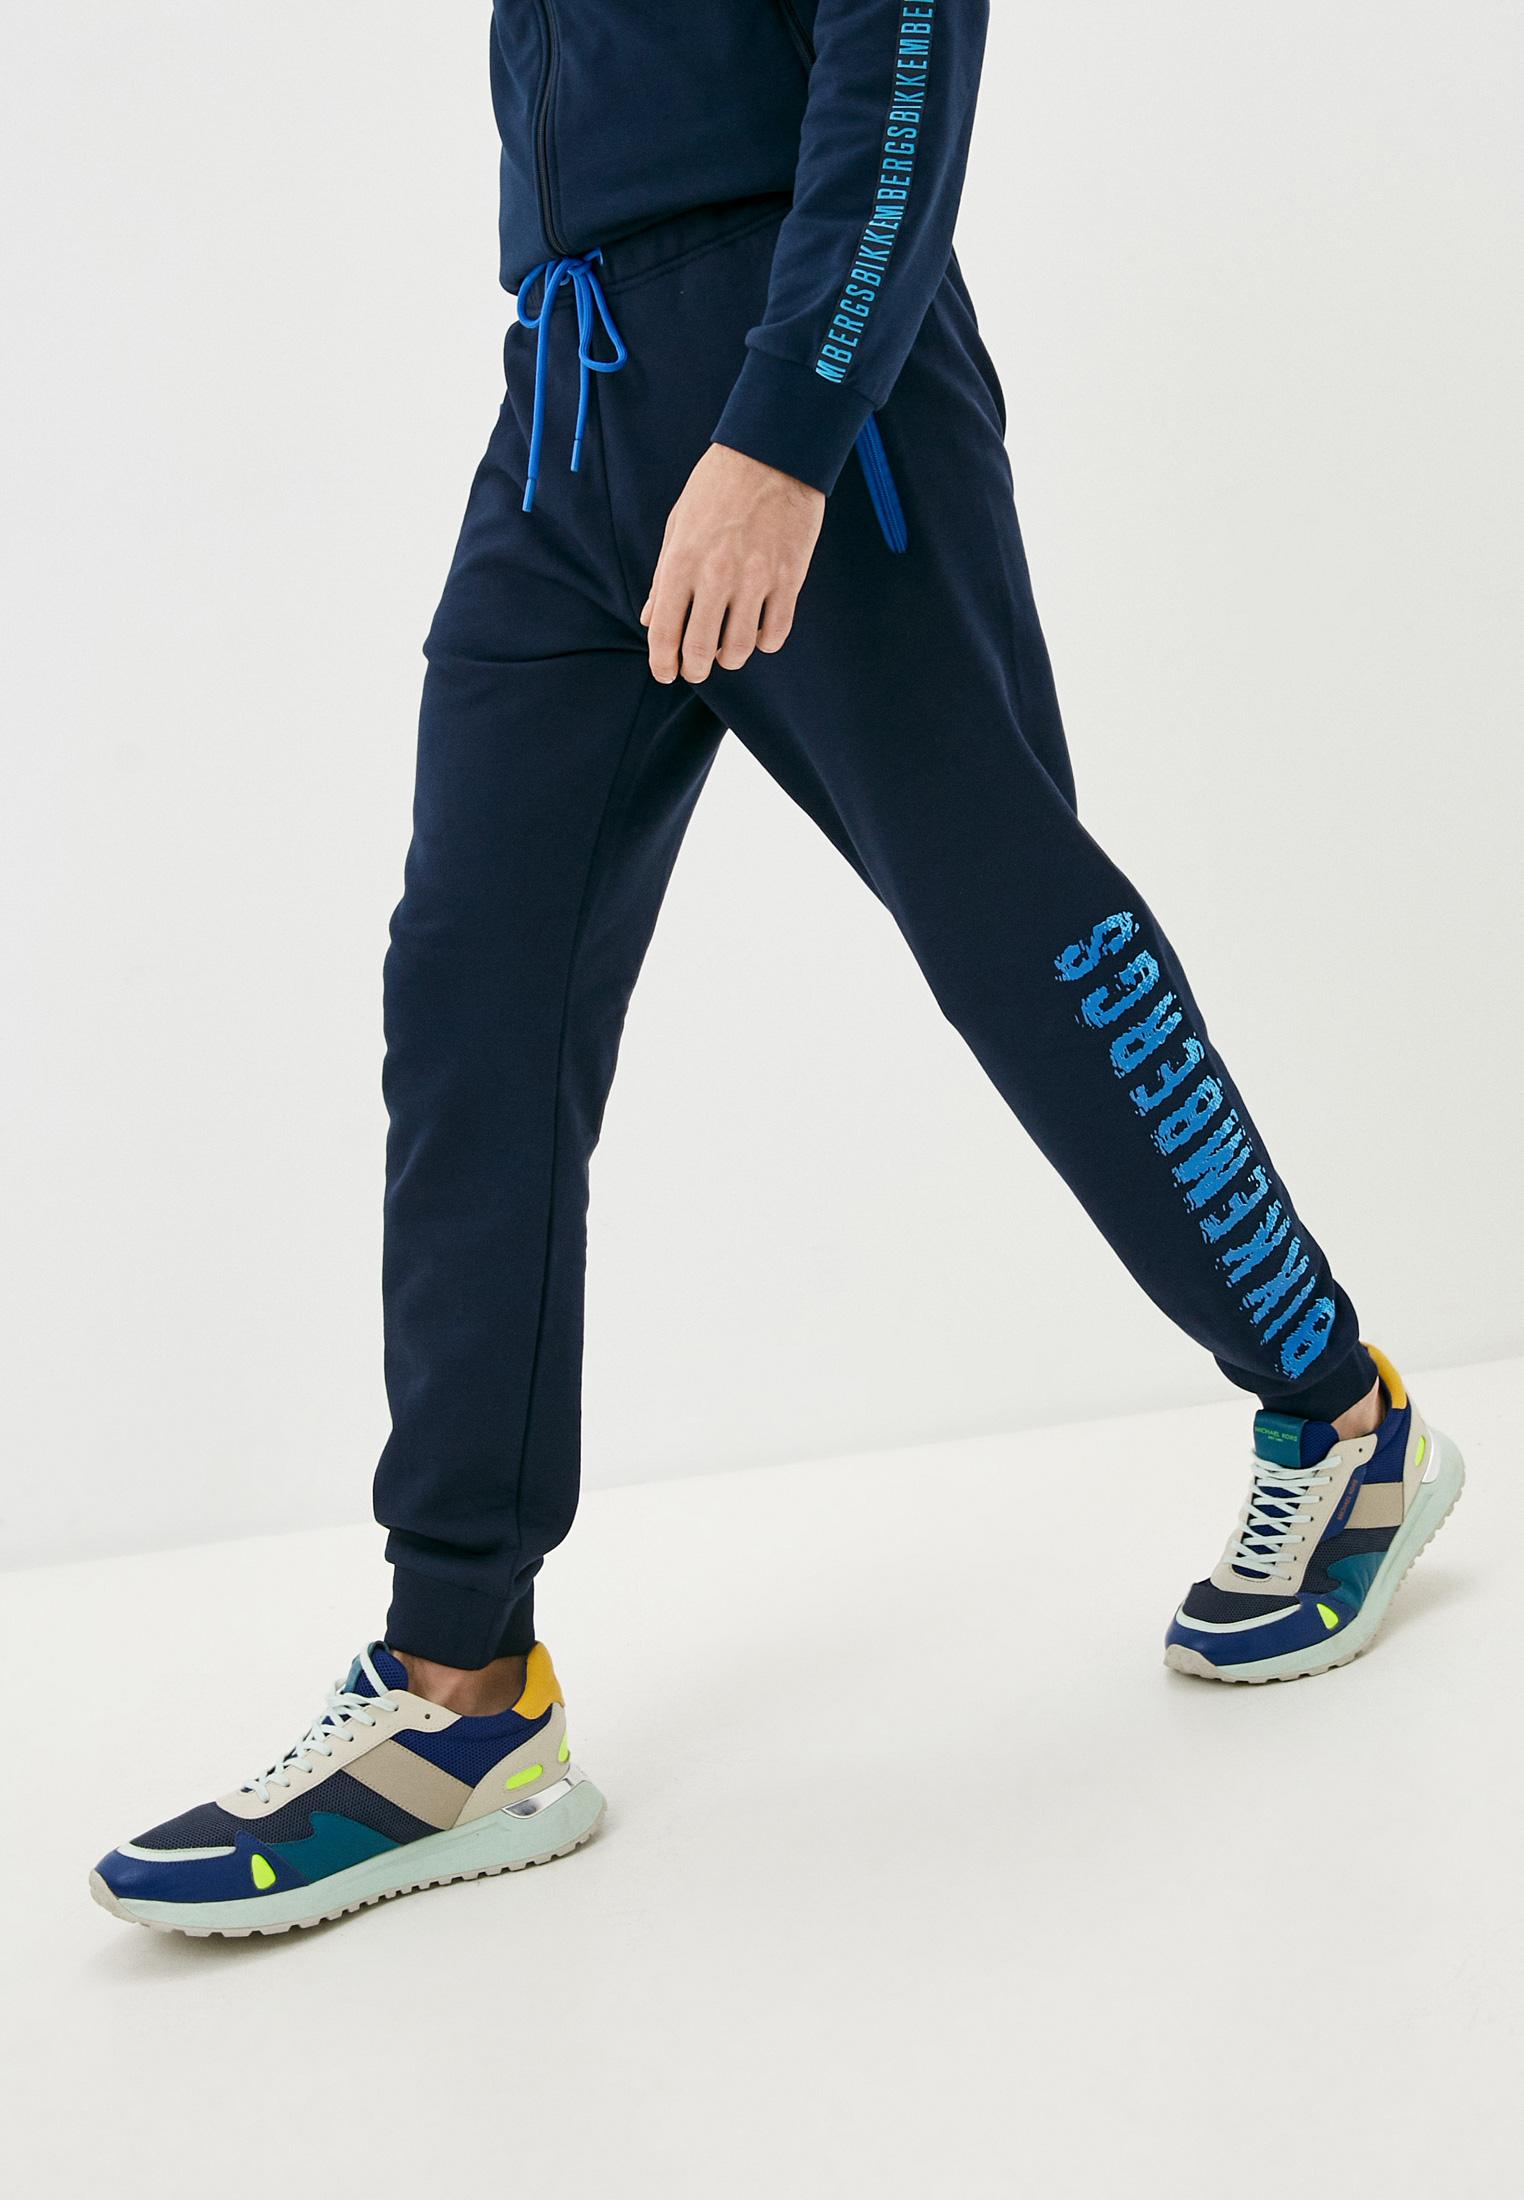 Мужские спортивные брюки Bikkembergs (Биккембергс) Брюки спортивные Bikkembergs